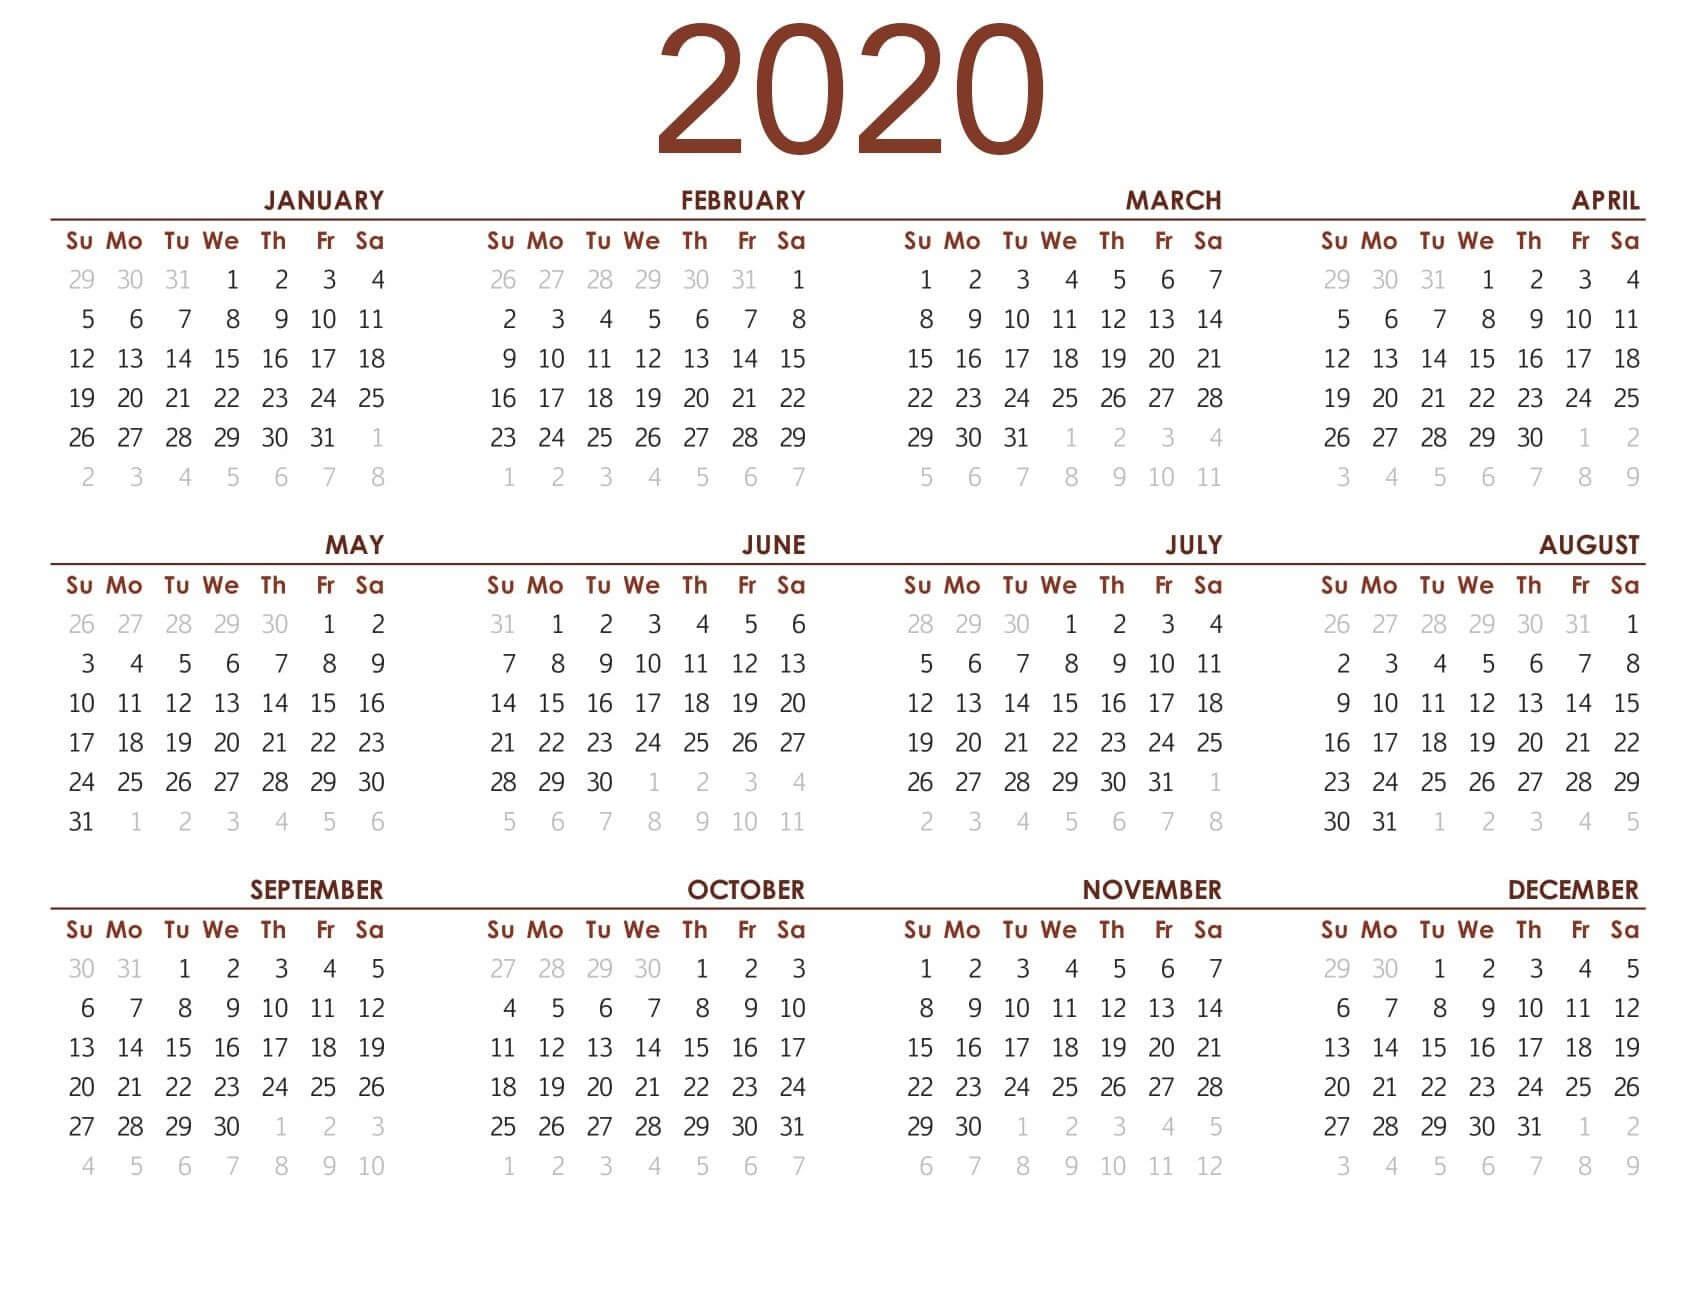 Printable Calendar 2020 With Notes - 2019 Calendars For